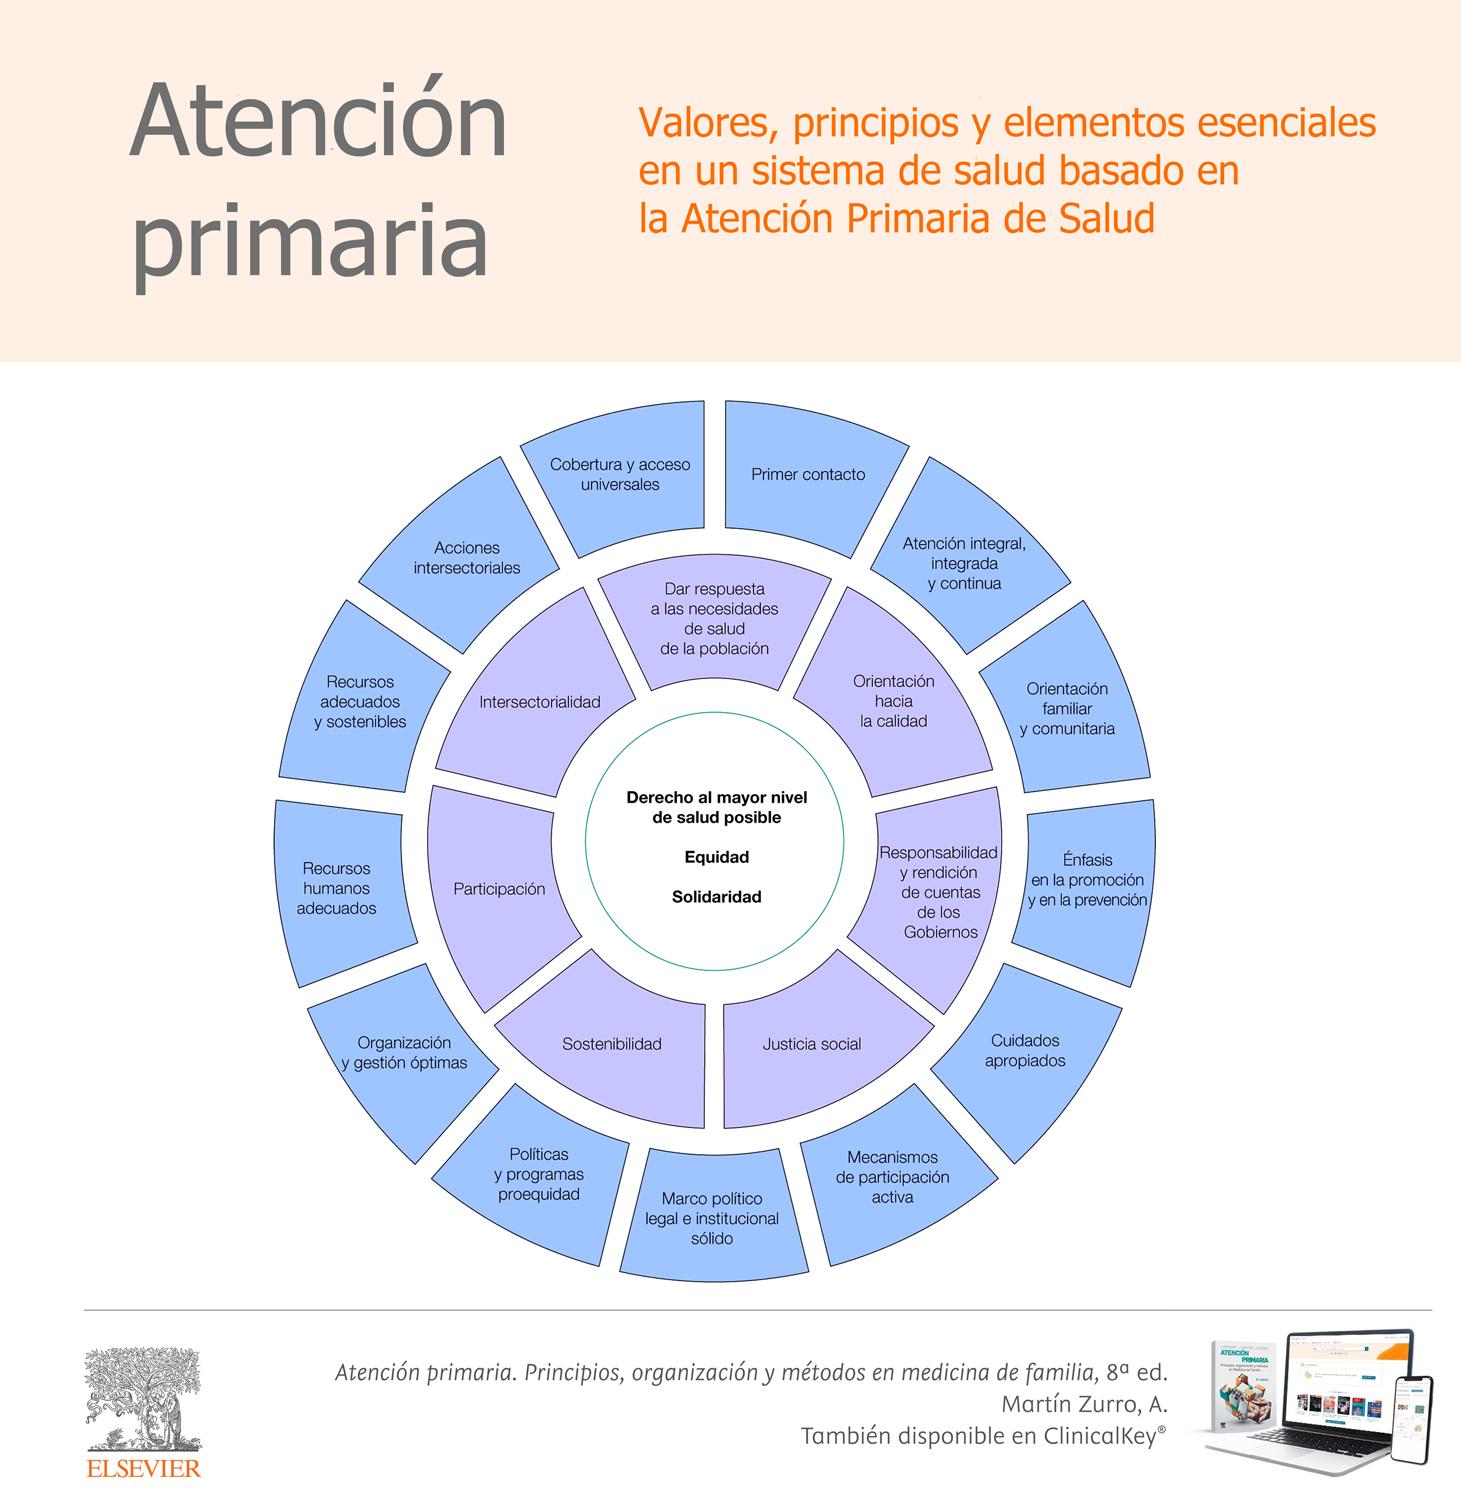 Modelo Atención primaria